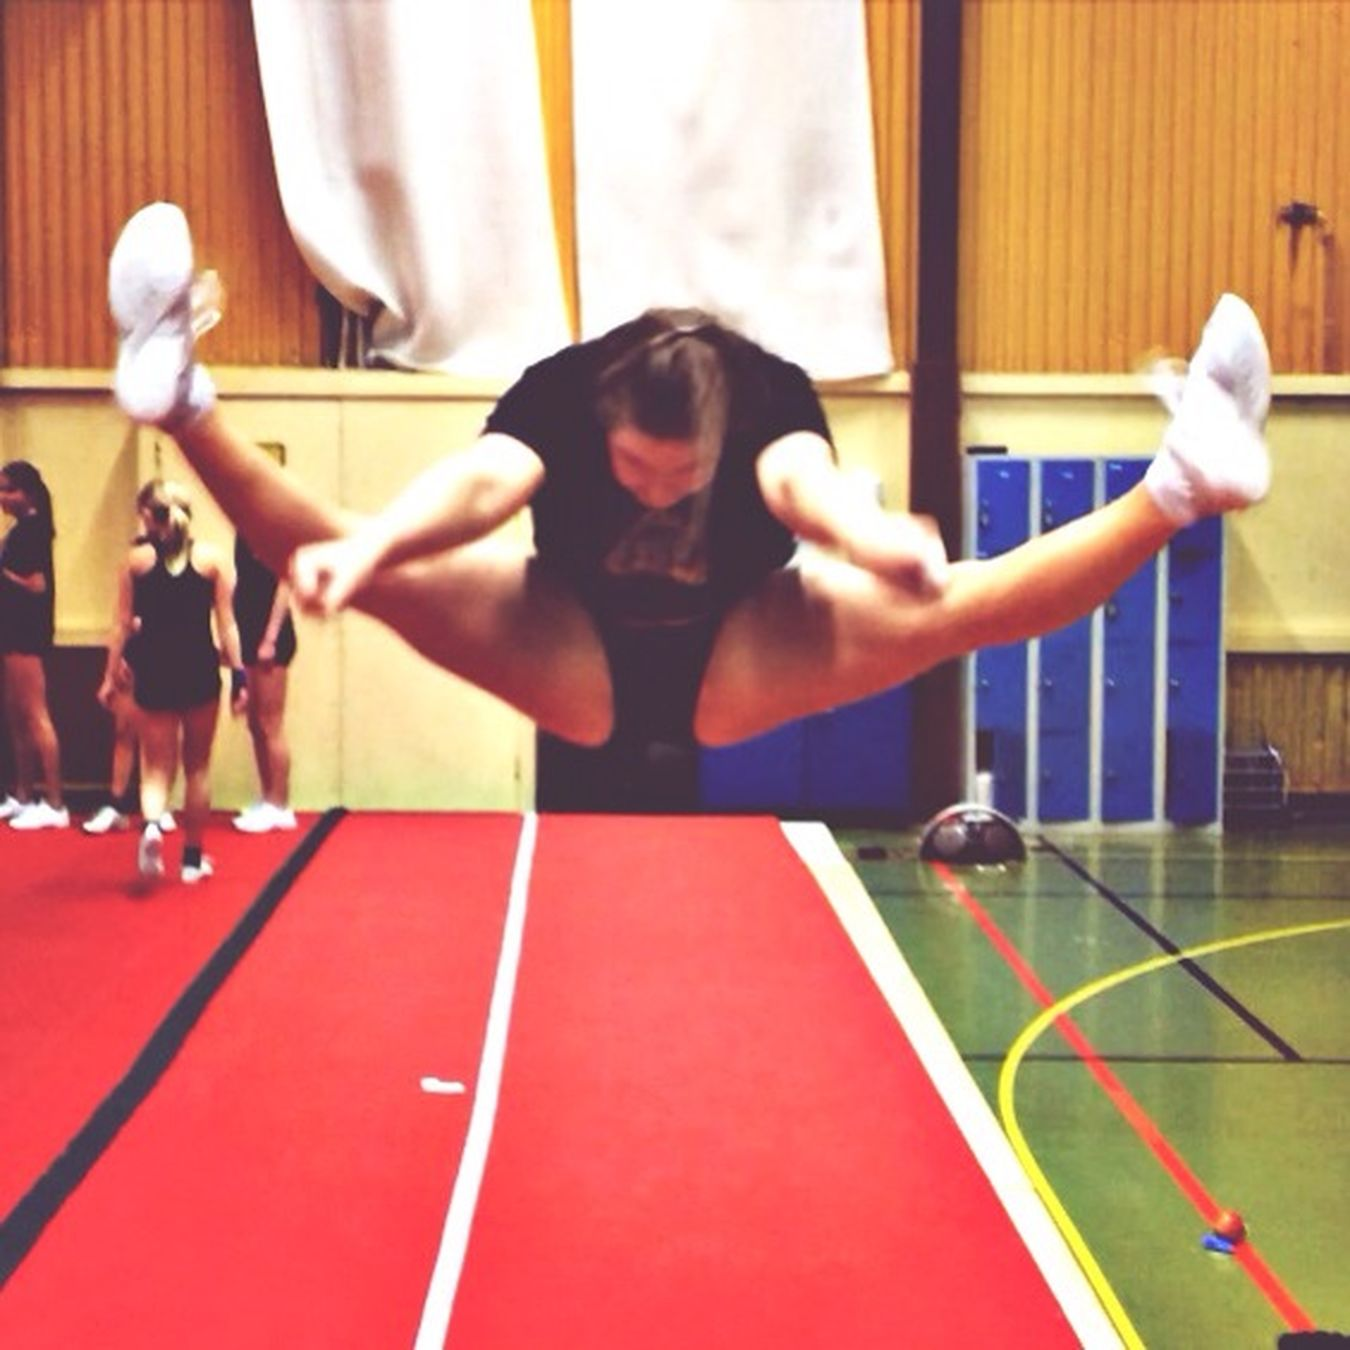 toetouch Cheerleading